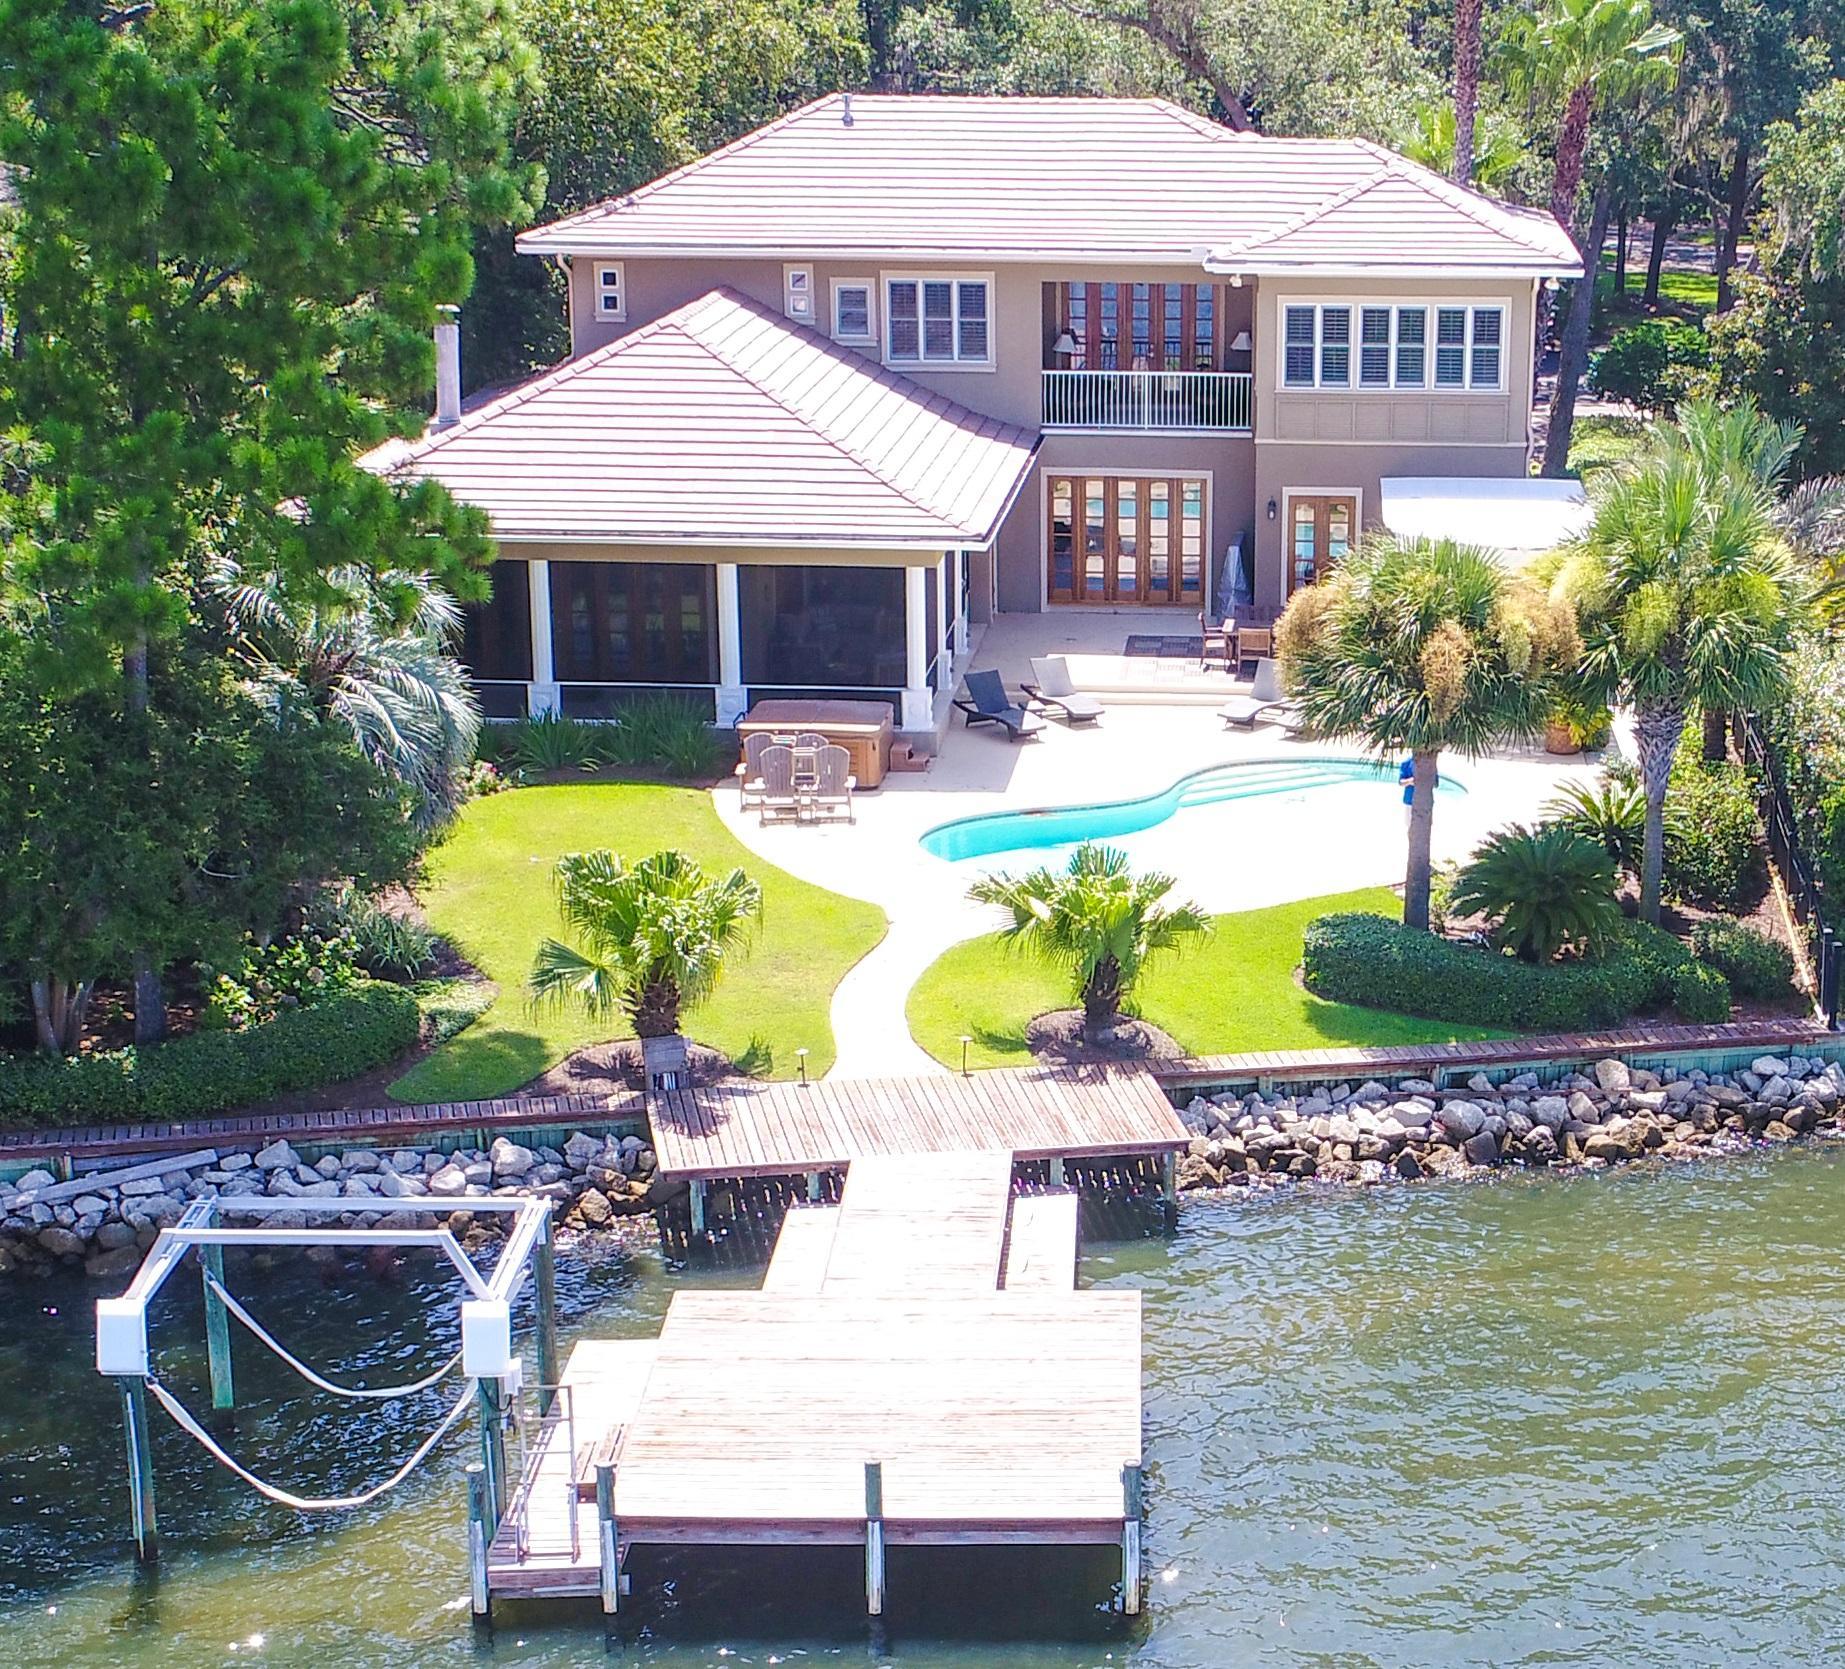 3038 The Oaks, Miramar Beach, FL 32550